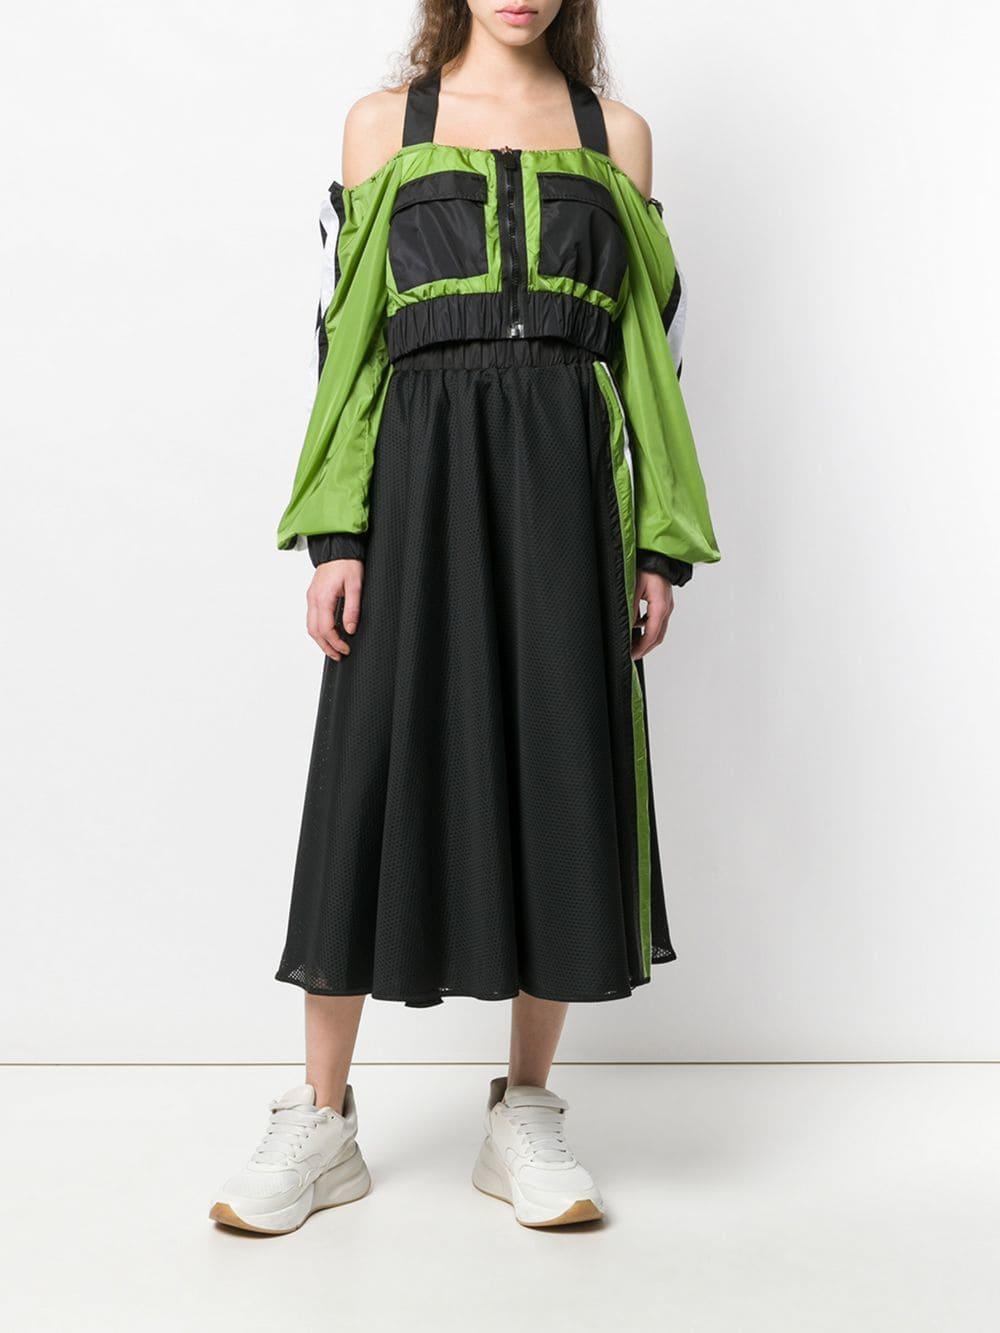 Falda de malla con raya lateral NO KA 'OI de Tejido sintético de color Negro